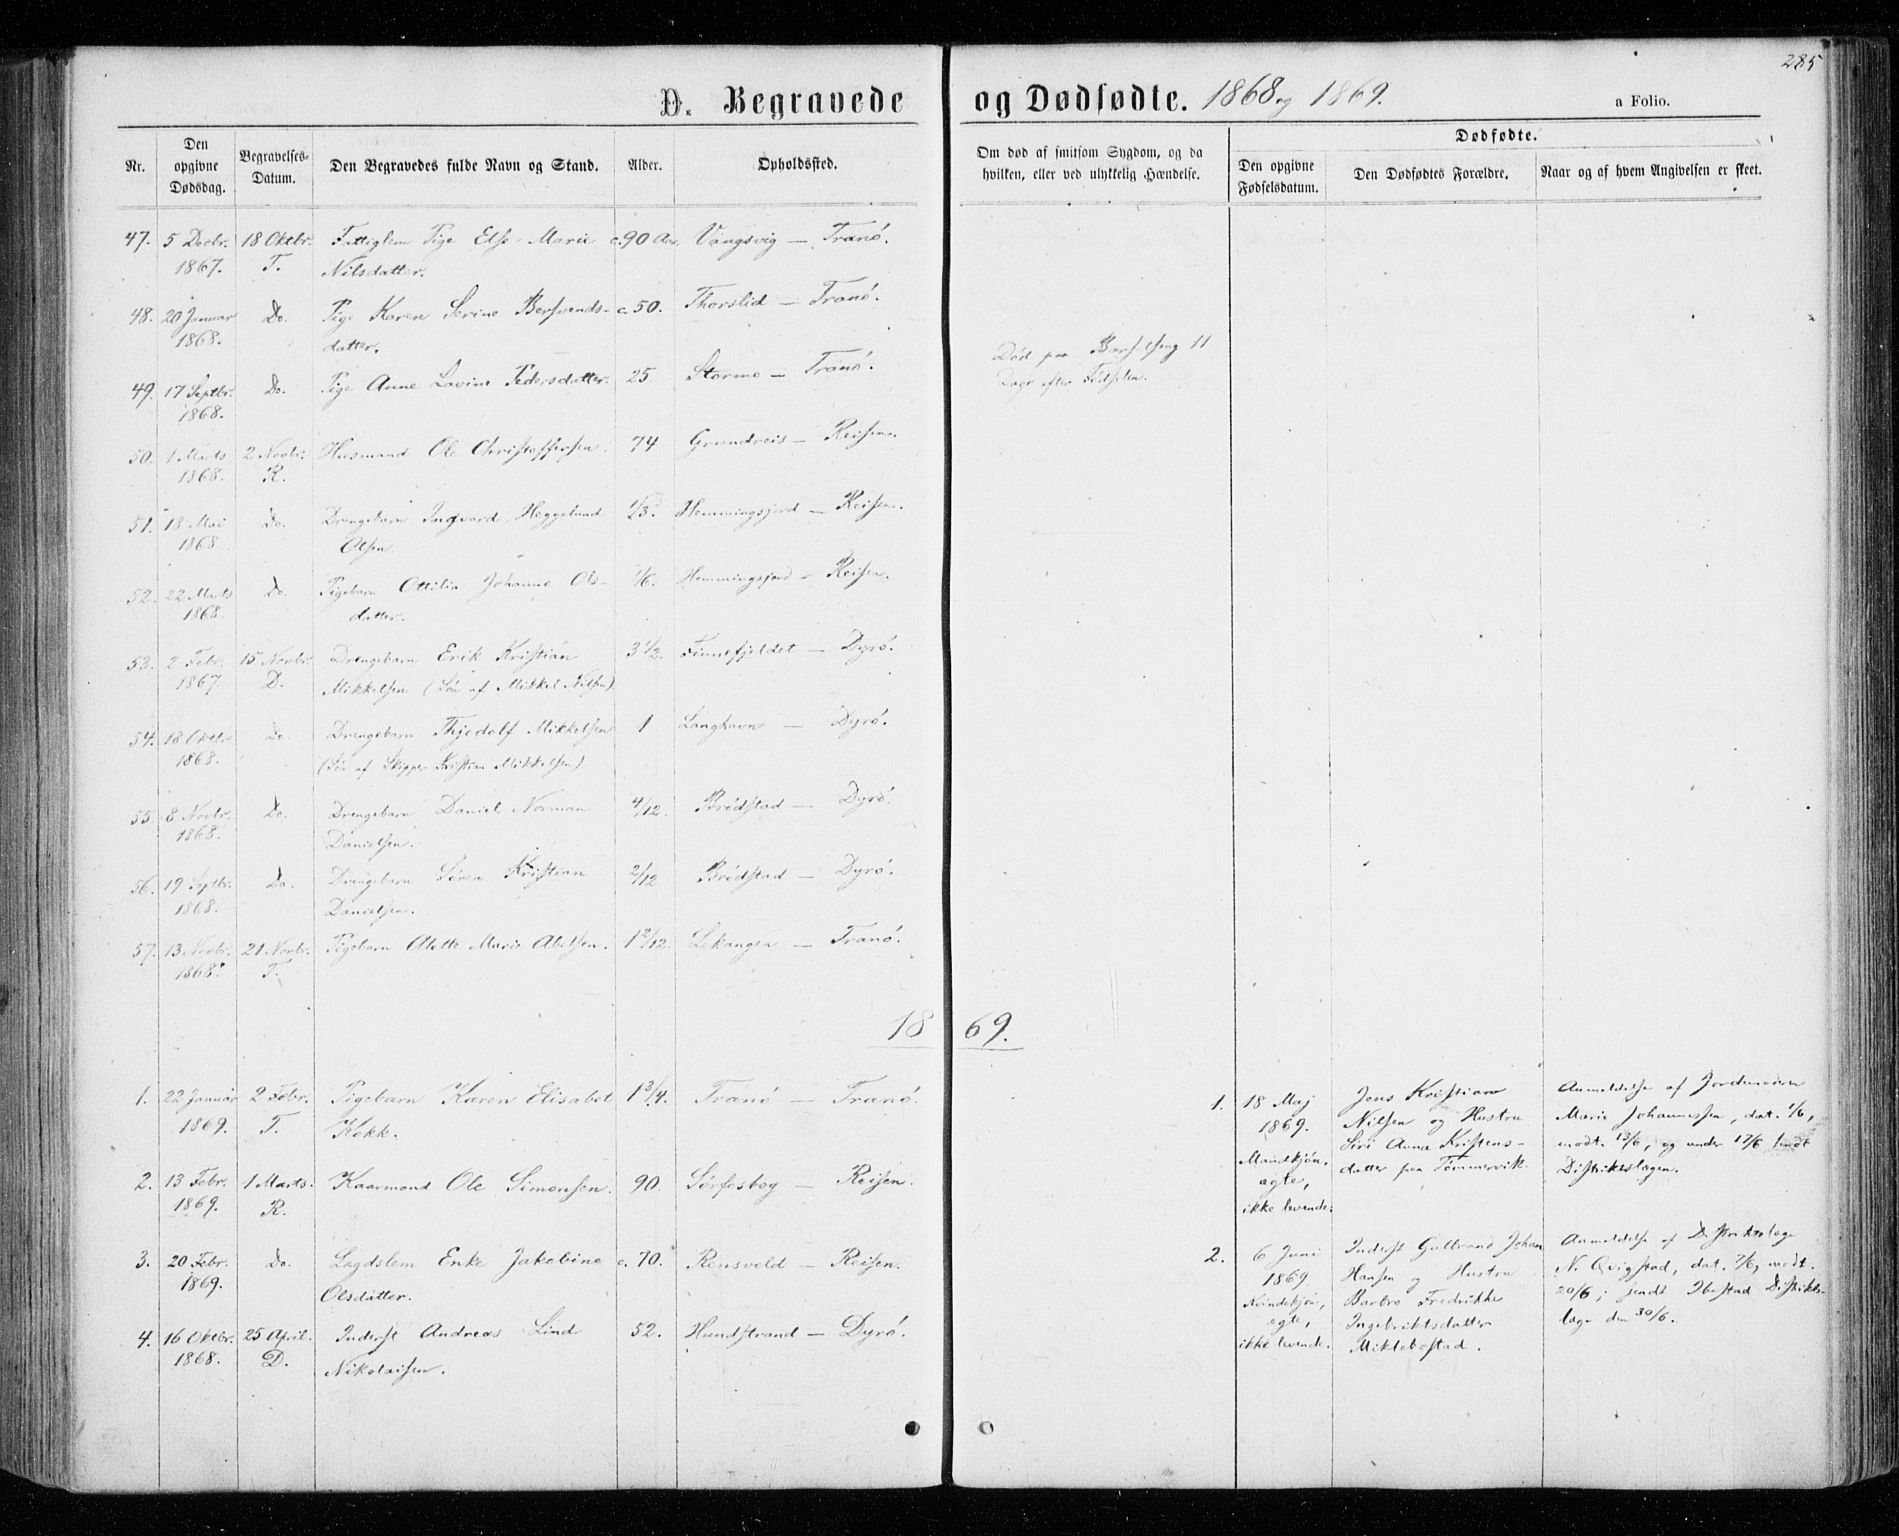 SATØ, Tranøy sokneprestkontor, I/Ia/Iaa/L0008kirke: Ministerialbok nr. 8, 1867-1877, s. 285